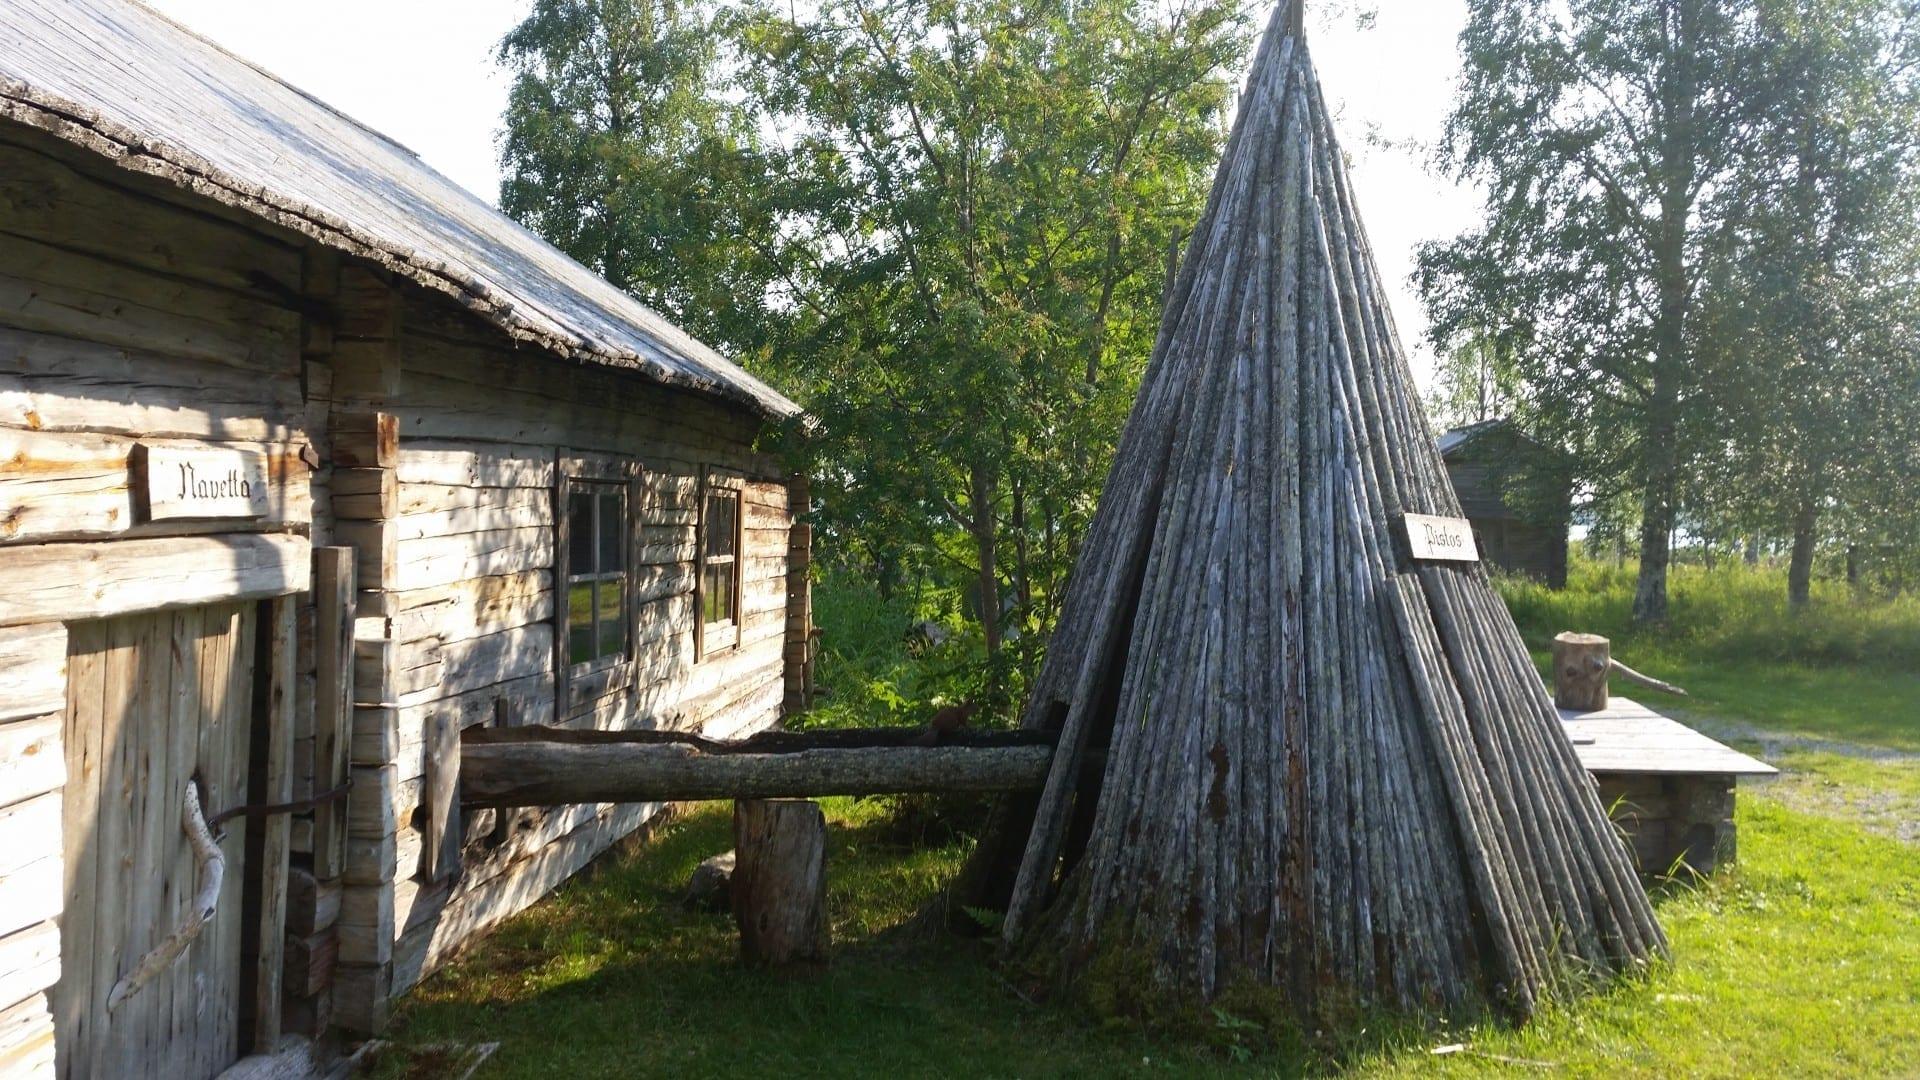 Museo de historia local Kuusamo Finlandia